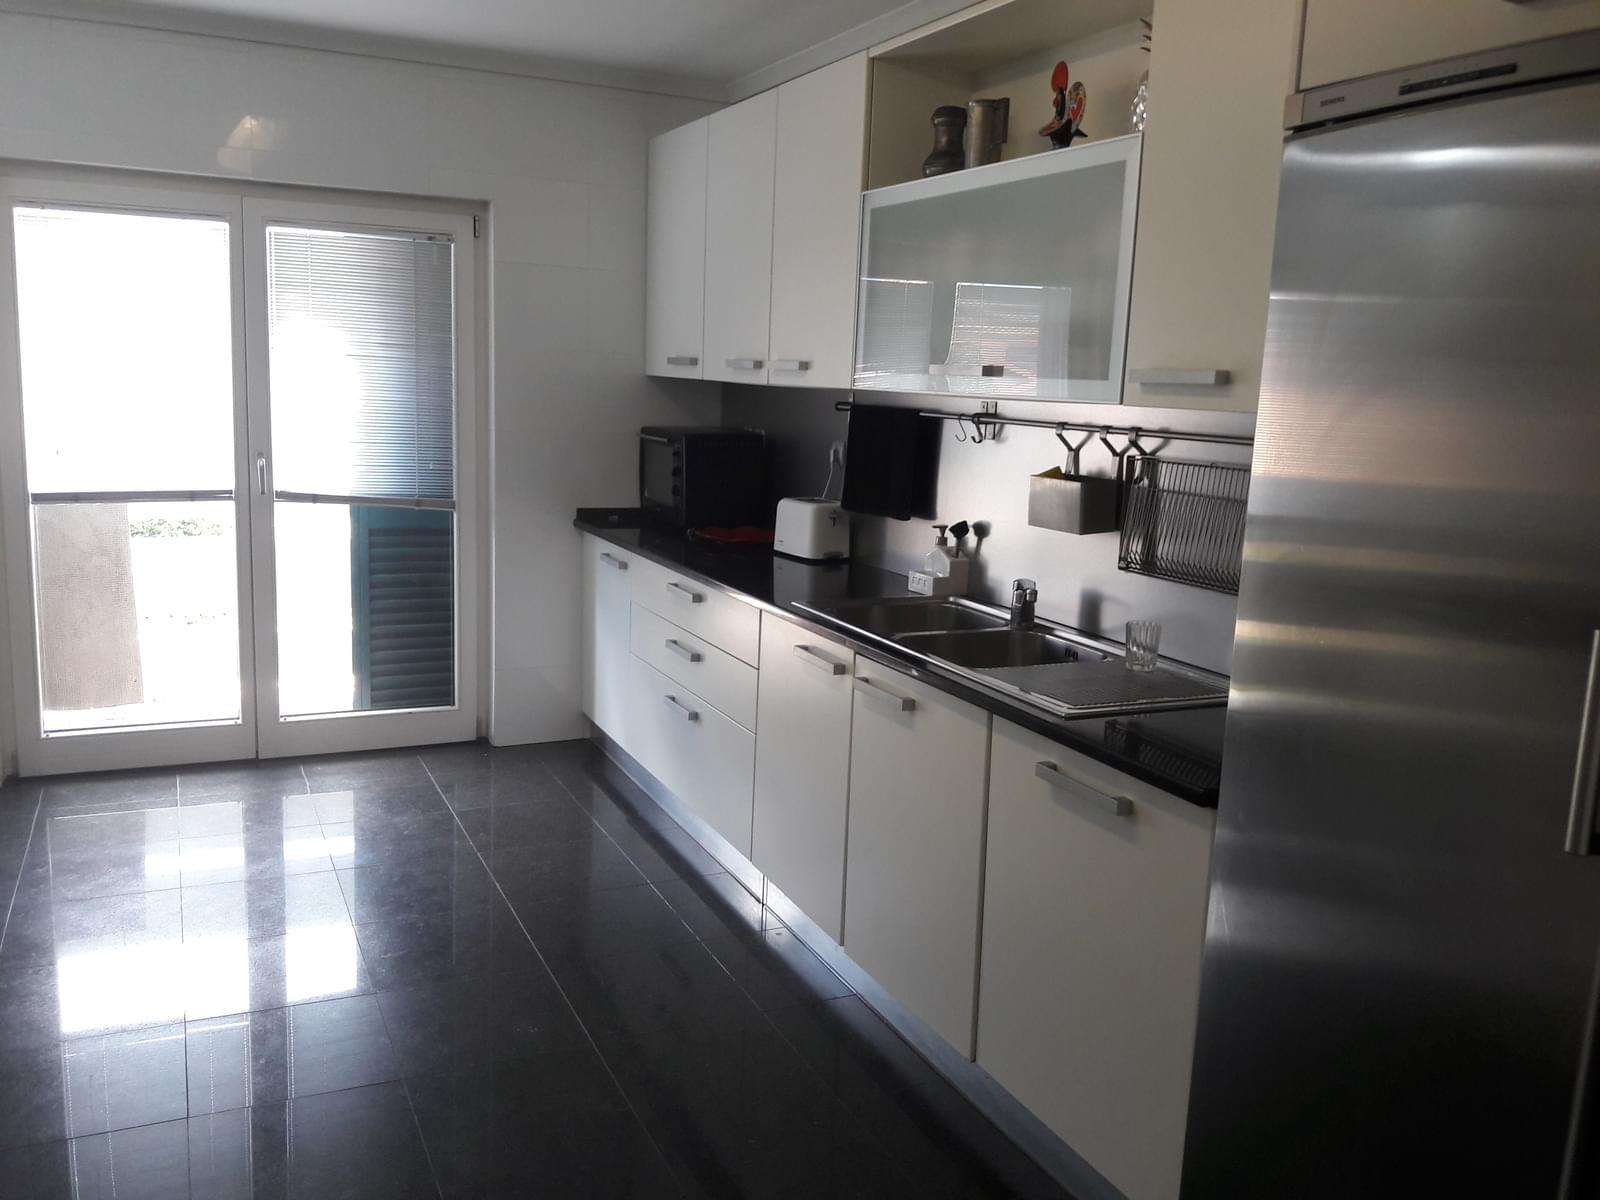 pf1888-apartamento-t4-cascais-1c1fce87-3cc7-403a-ac7a-c549b57c6516